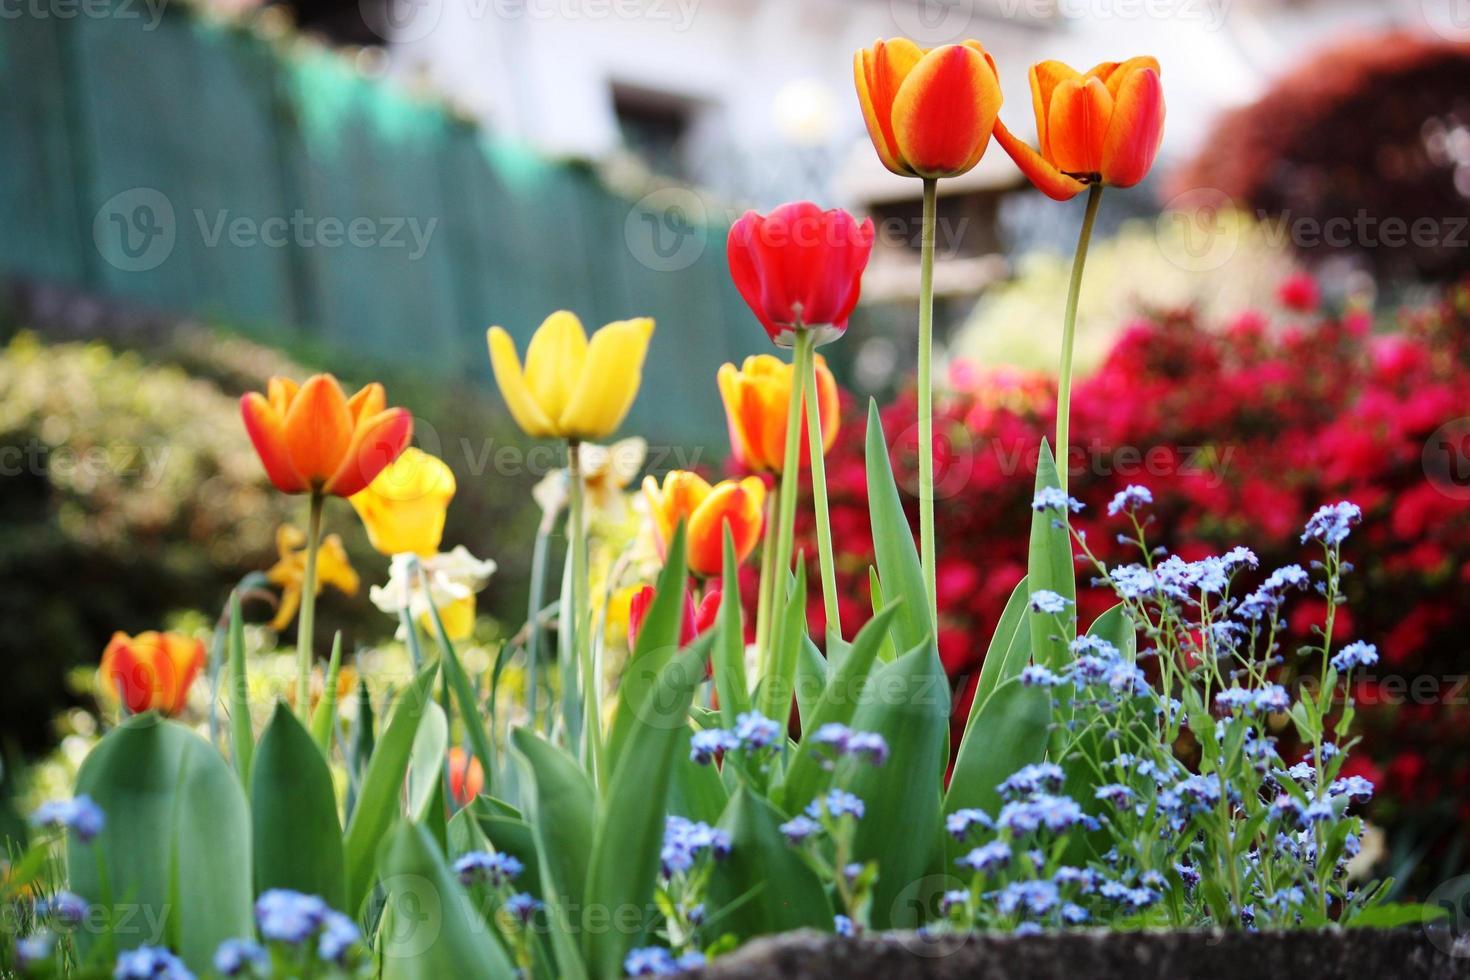 Tulpen, Narissen, Vergissmeinnichte, Azaleen-Frühlingsgarten am Lago Maggiore, Nahaufnahme foto